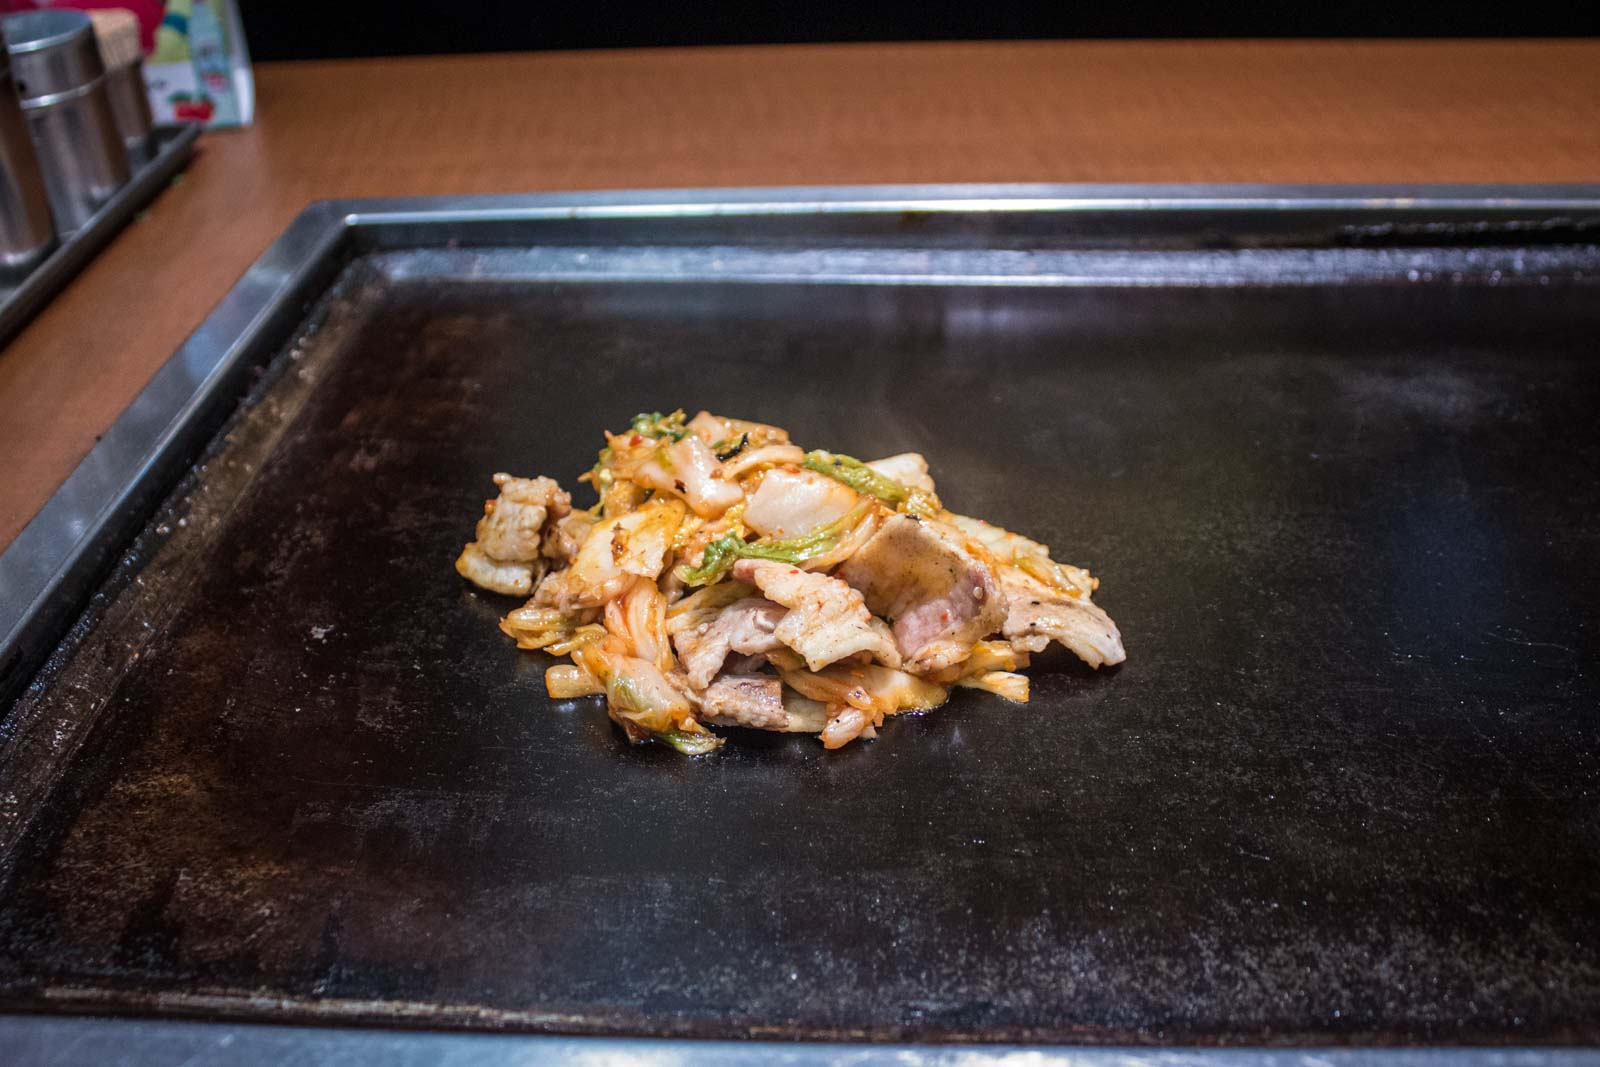 teppanyaki, japanese food, japanese dishes, grilled food in japan, teppanyaki restaurants